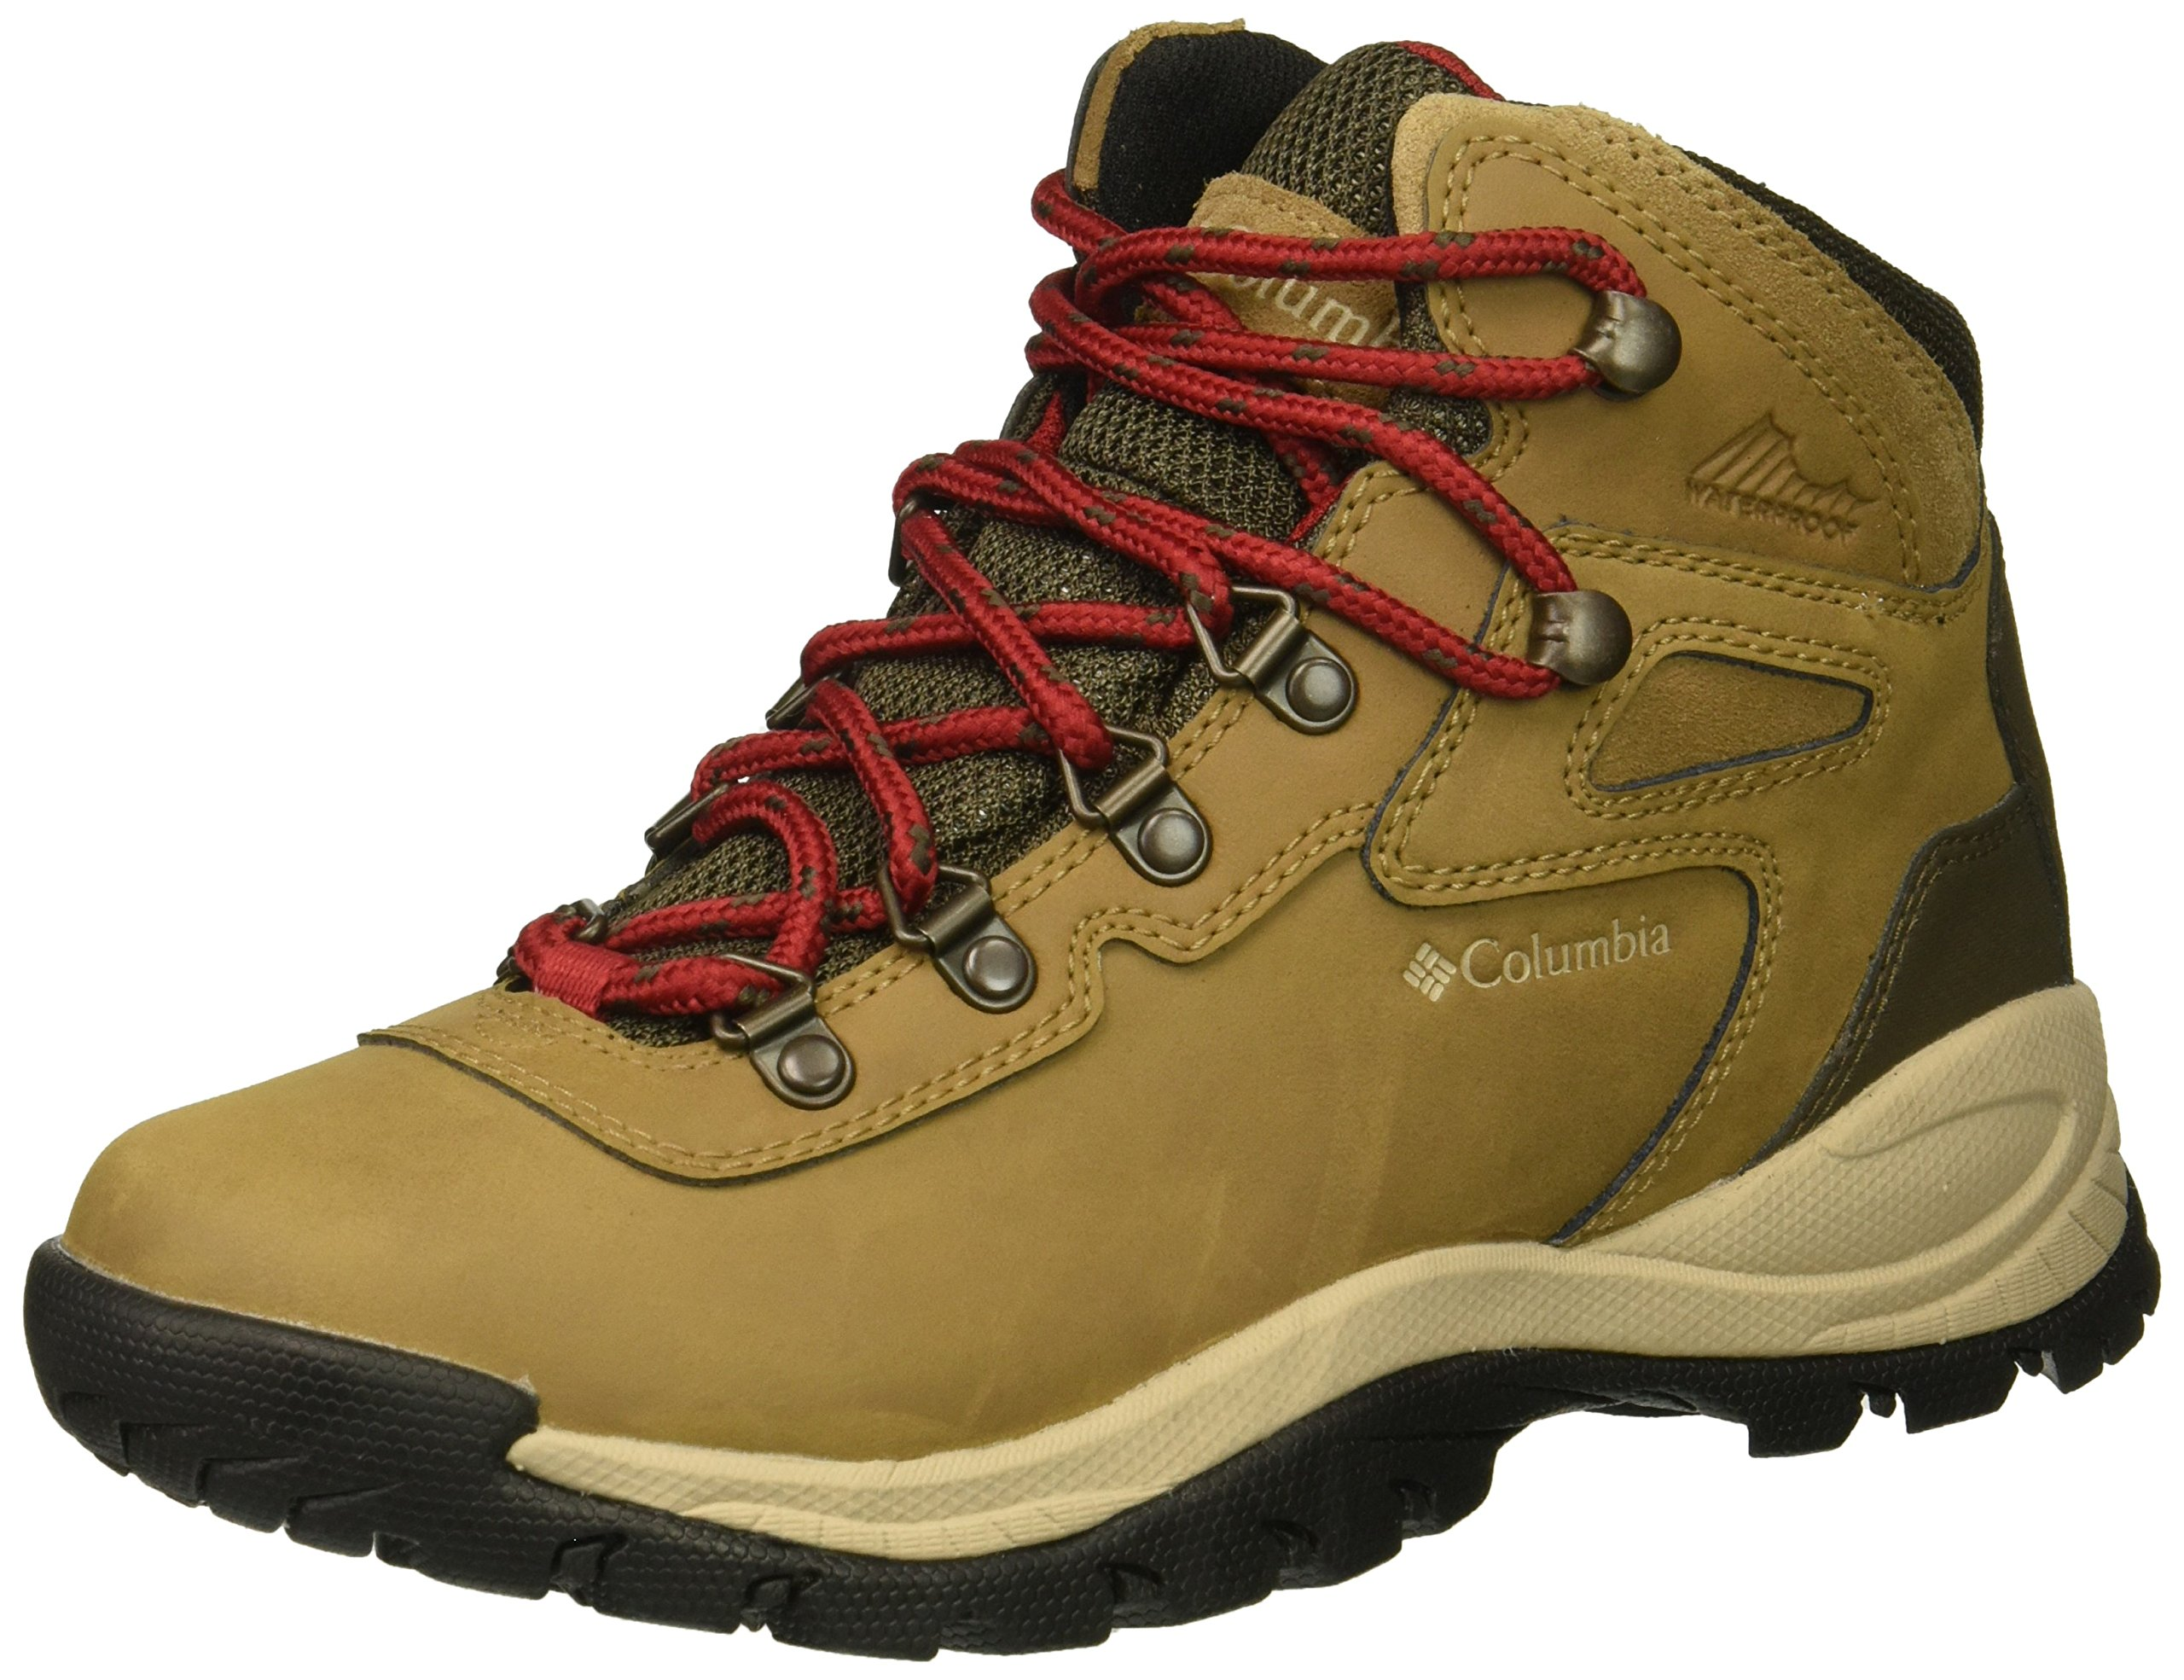 Columbia Women's Newton Ridge Plus Hiking Shoe, Delta, Red Velvet, 8 Wide US